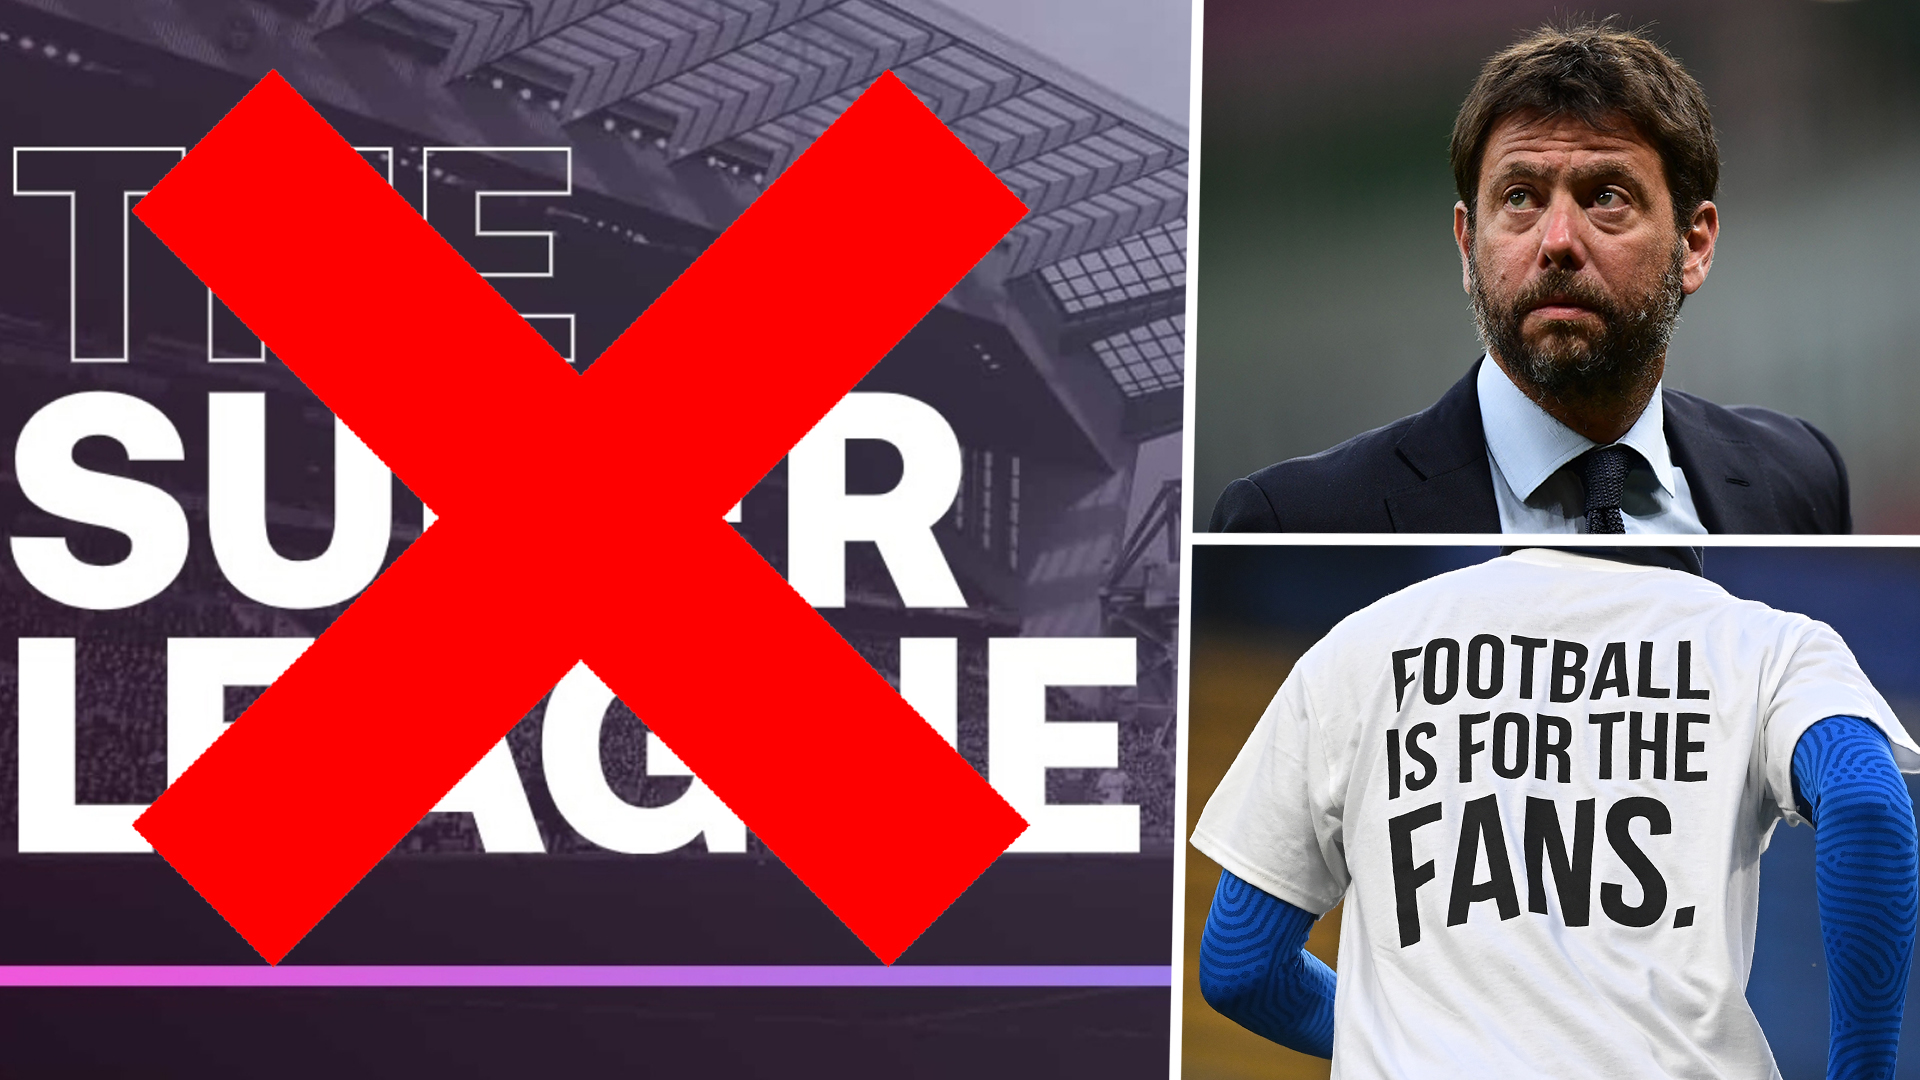 Super League falls apart: Agnelli confirms new competition cannot go ahead after Premier League teams withdraw | Goal.com